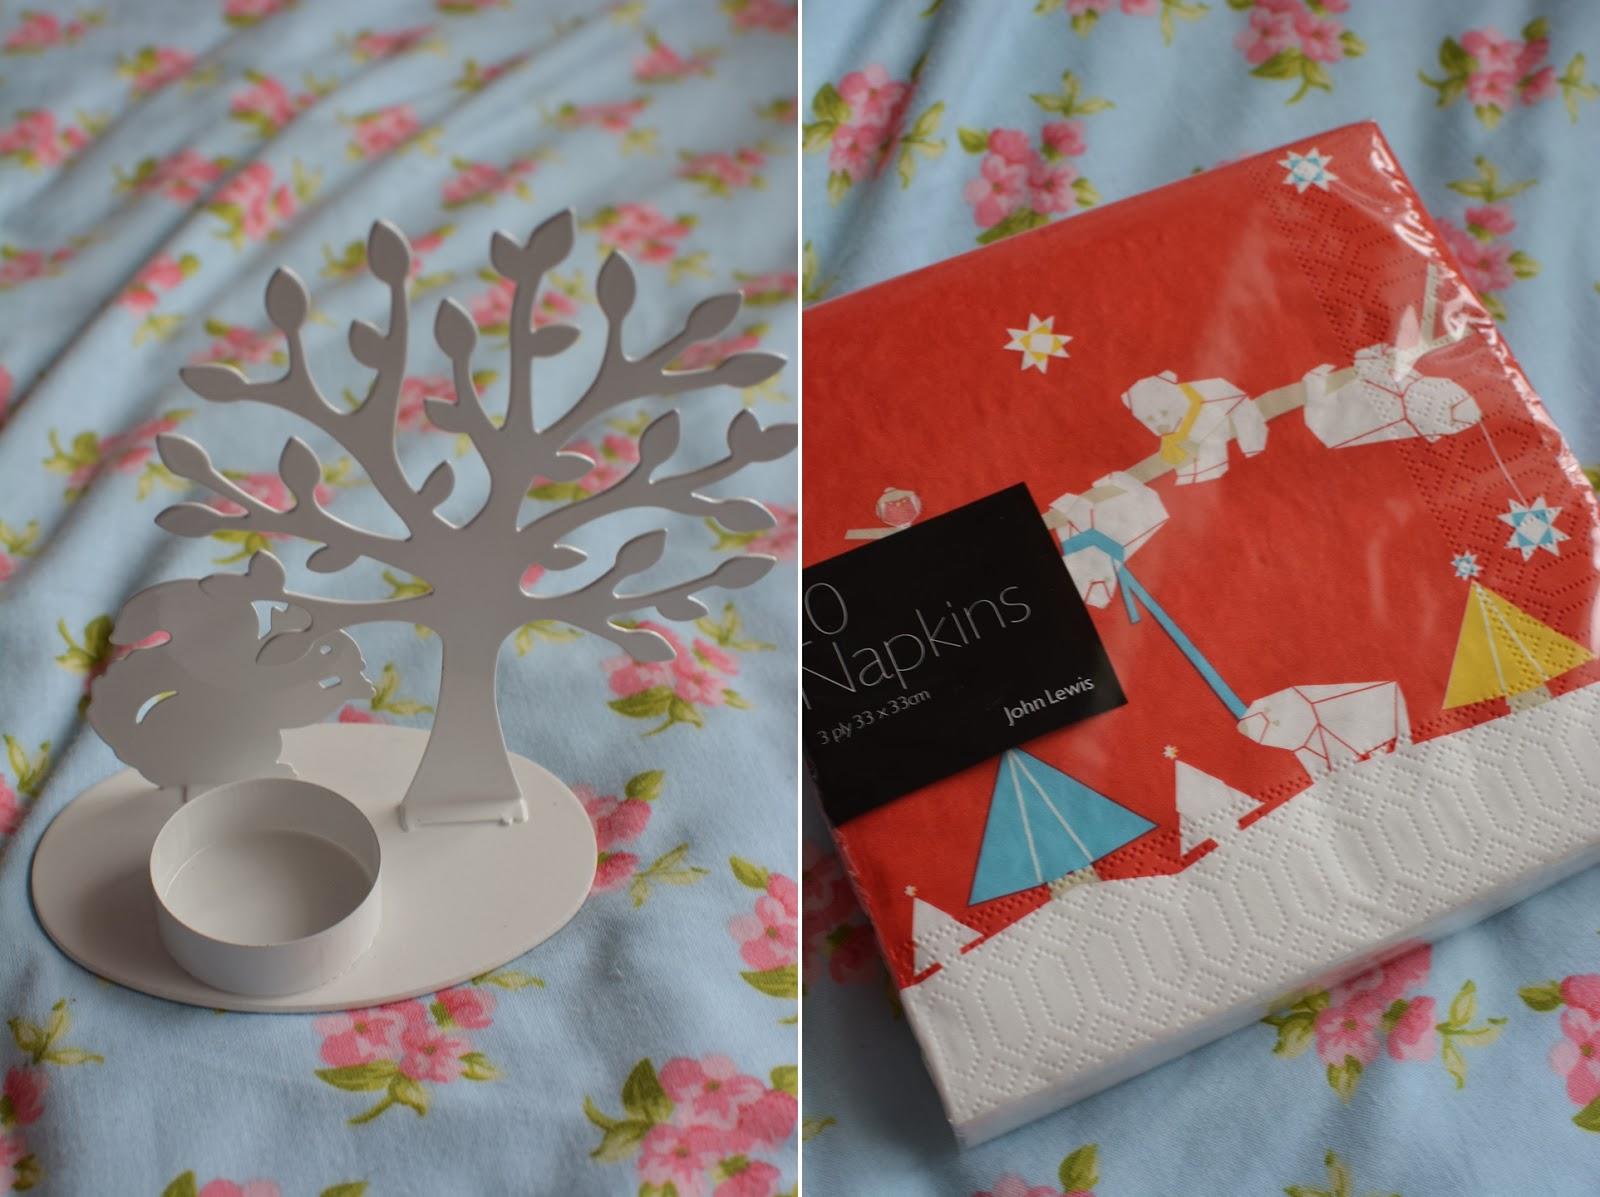 January sales haul tessa holly John lewis christmas ornaments